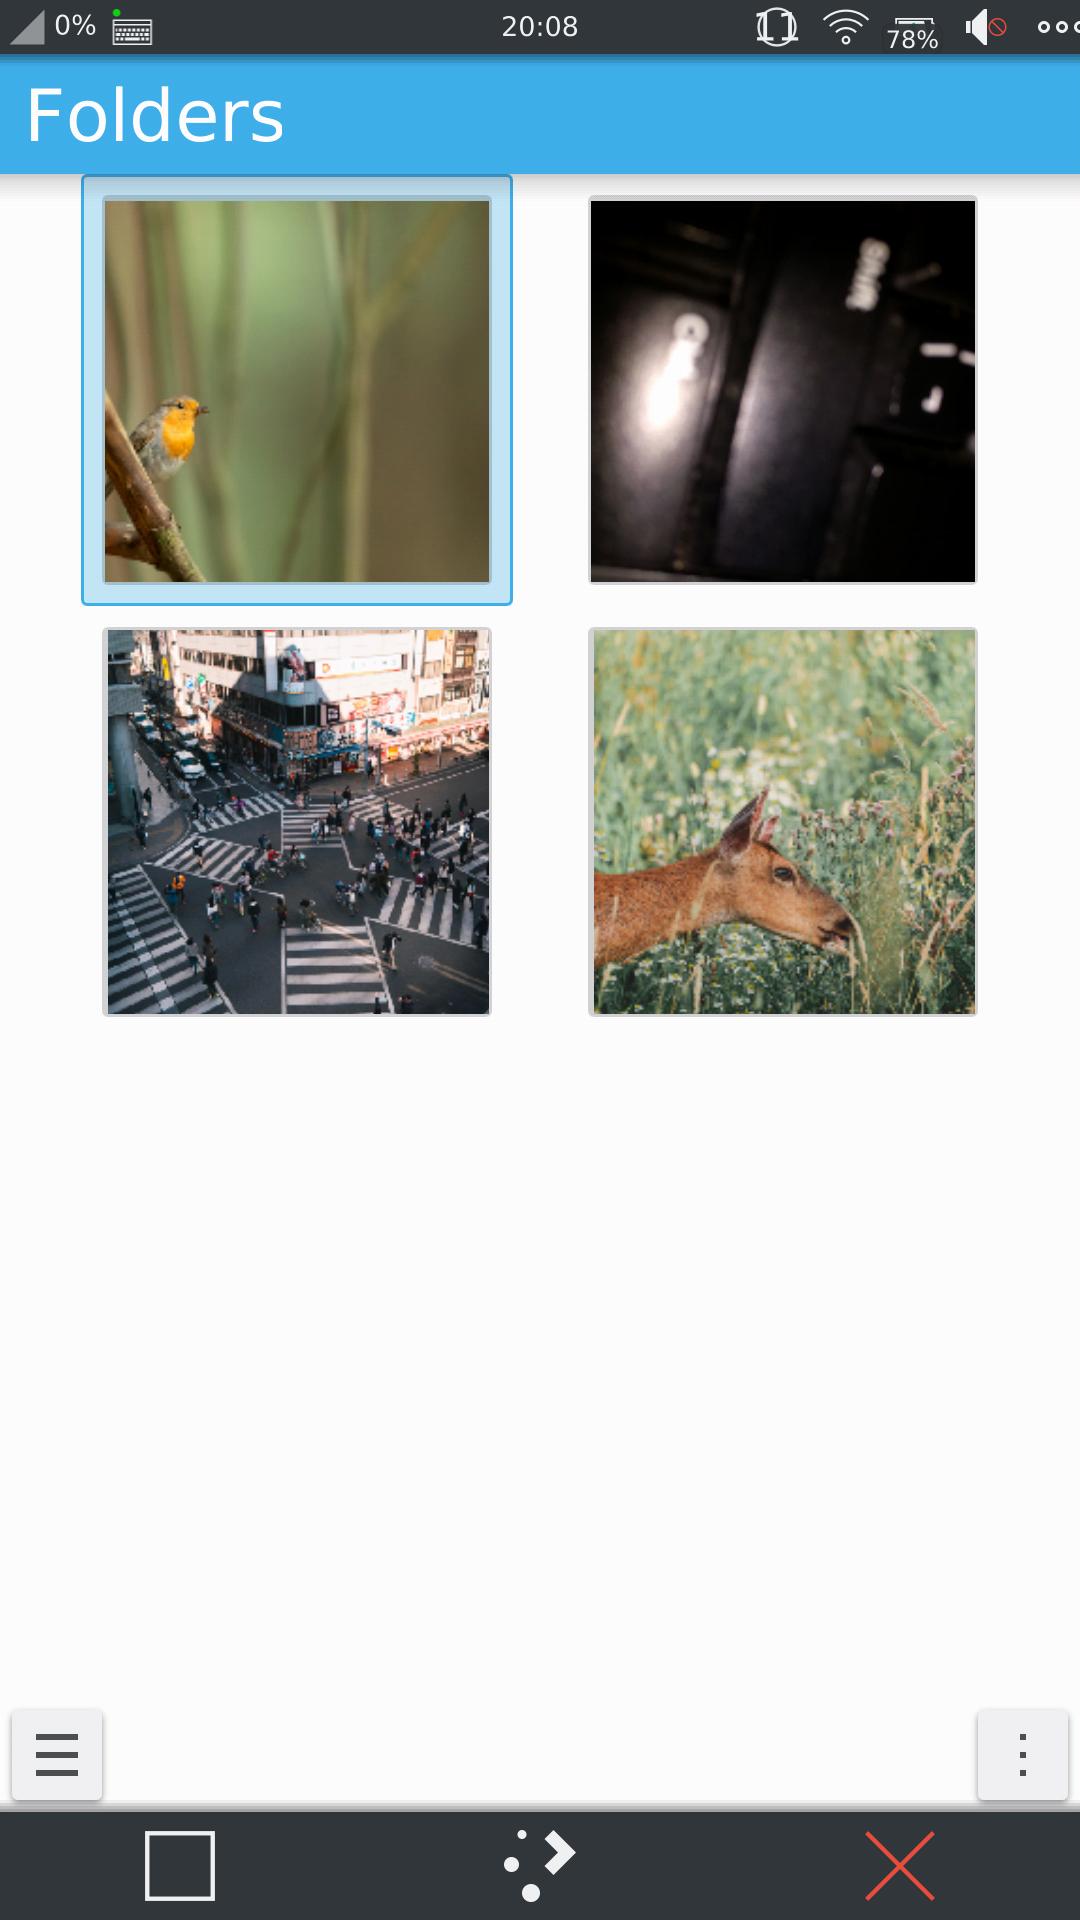 img/screenshots/koko.png